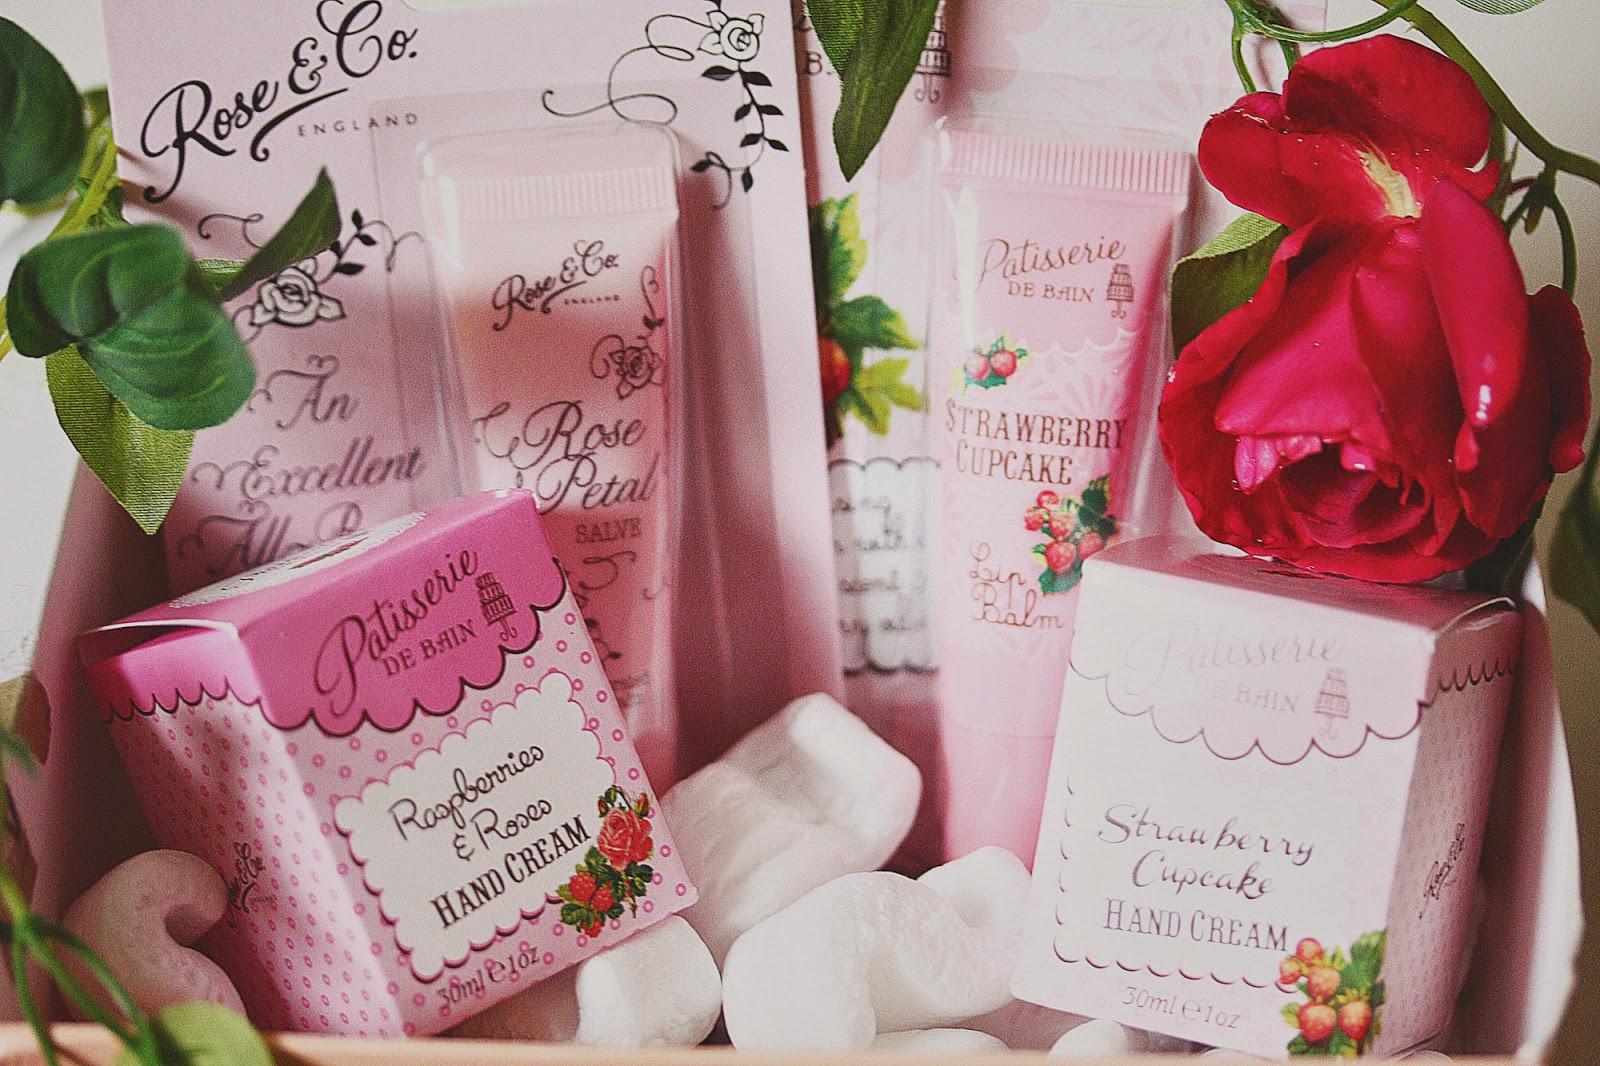 http://rosemademoiselle.blogspot.com/2014/11/rose-coapothecary-haul.html